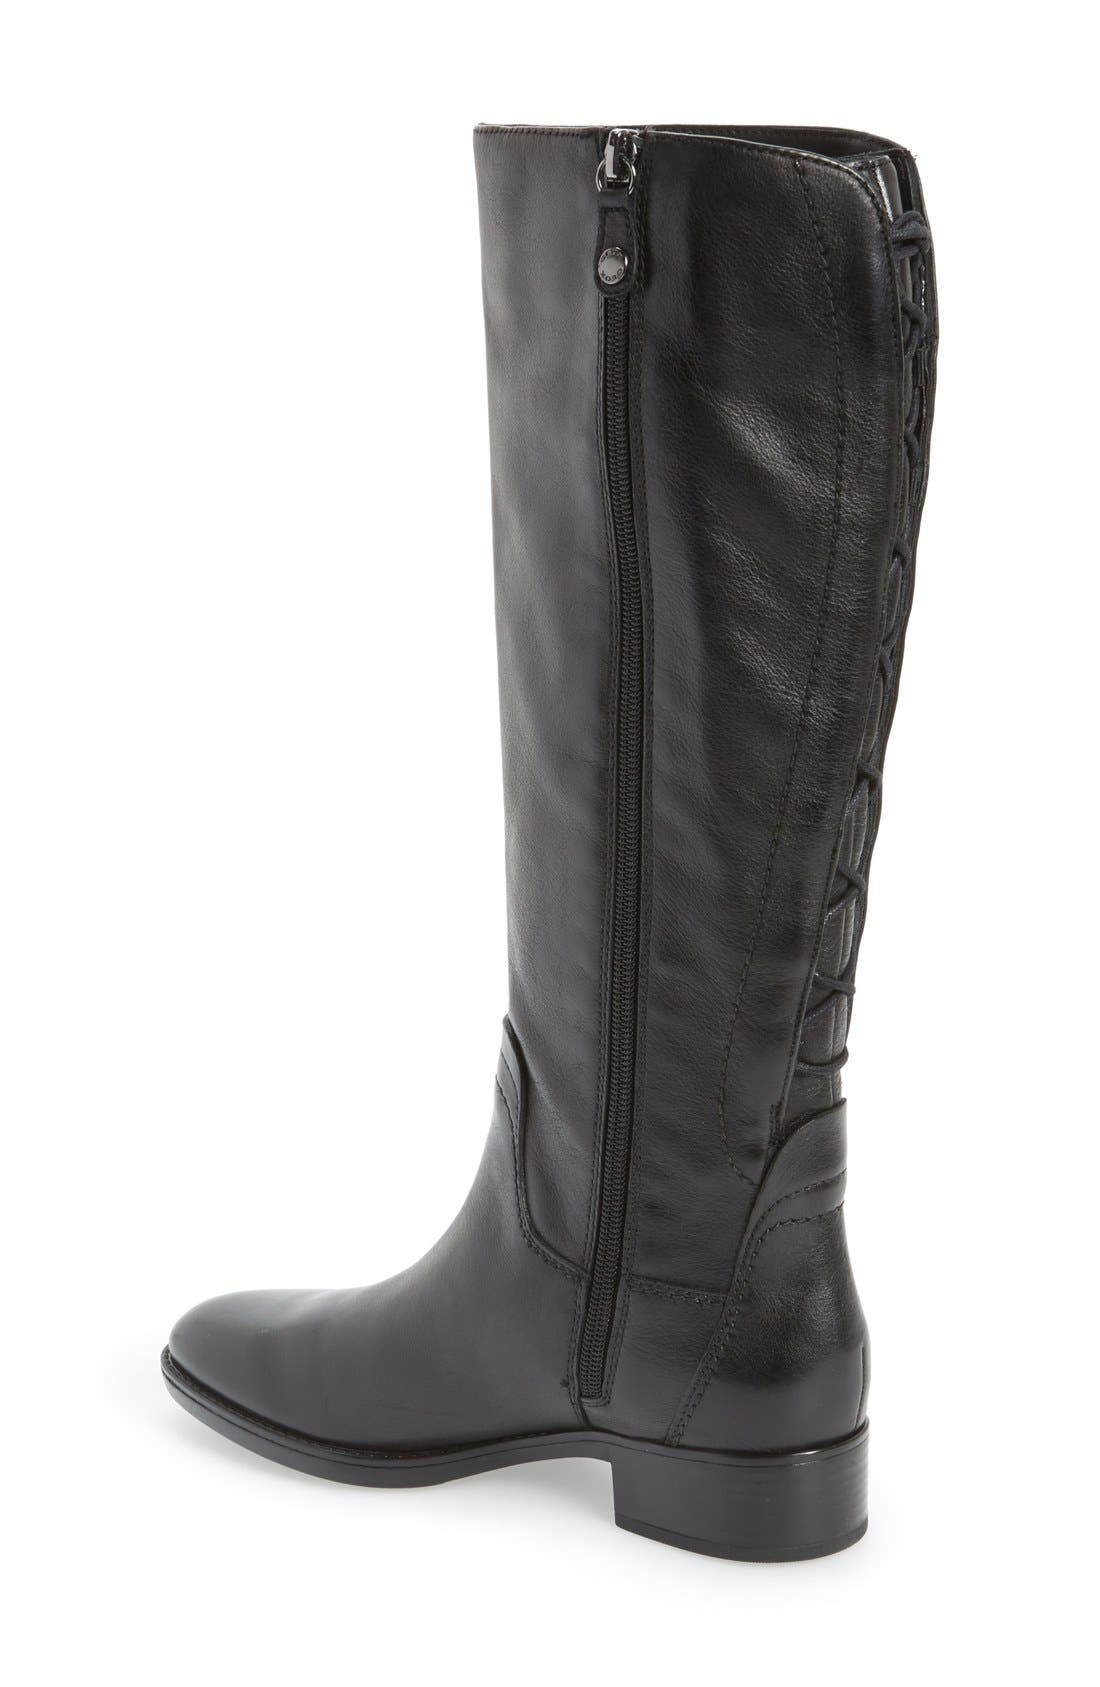 Alternate Image 2  - Geox 'Felicity' Adjustable Shaft Tall Riding Boot (Women)